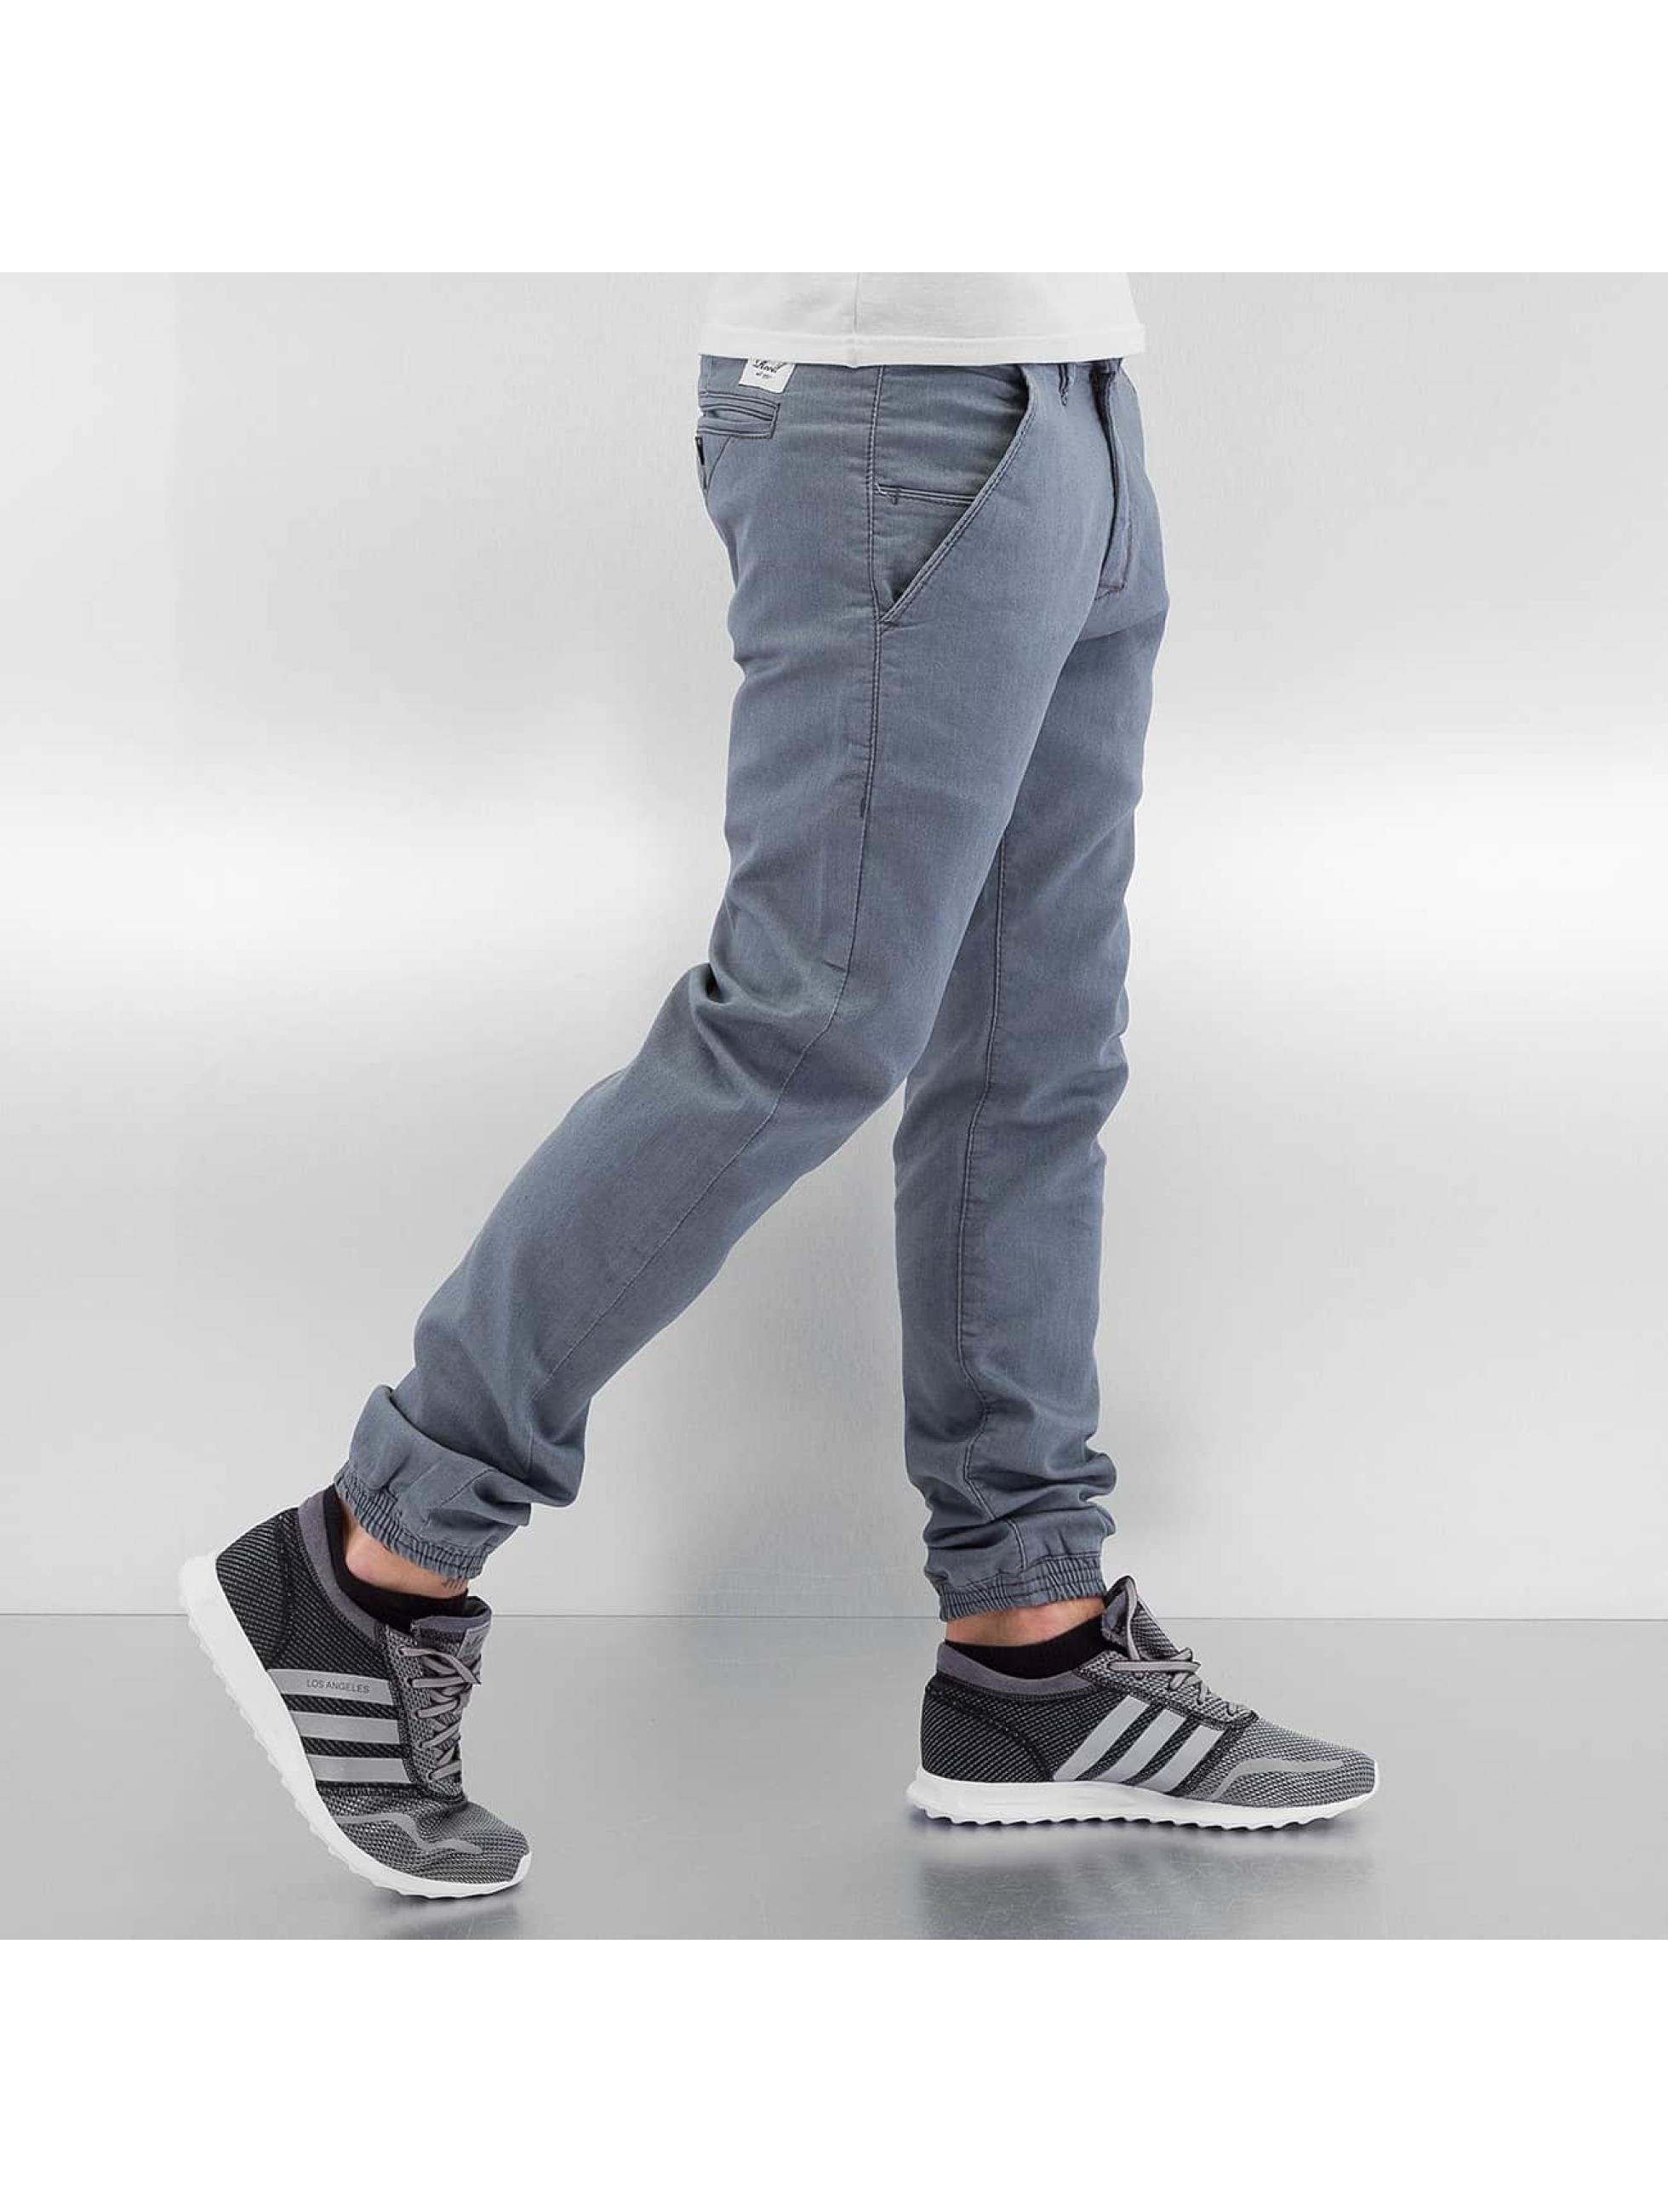 Reell Jeans Pantalon chino Jogger gris